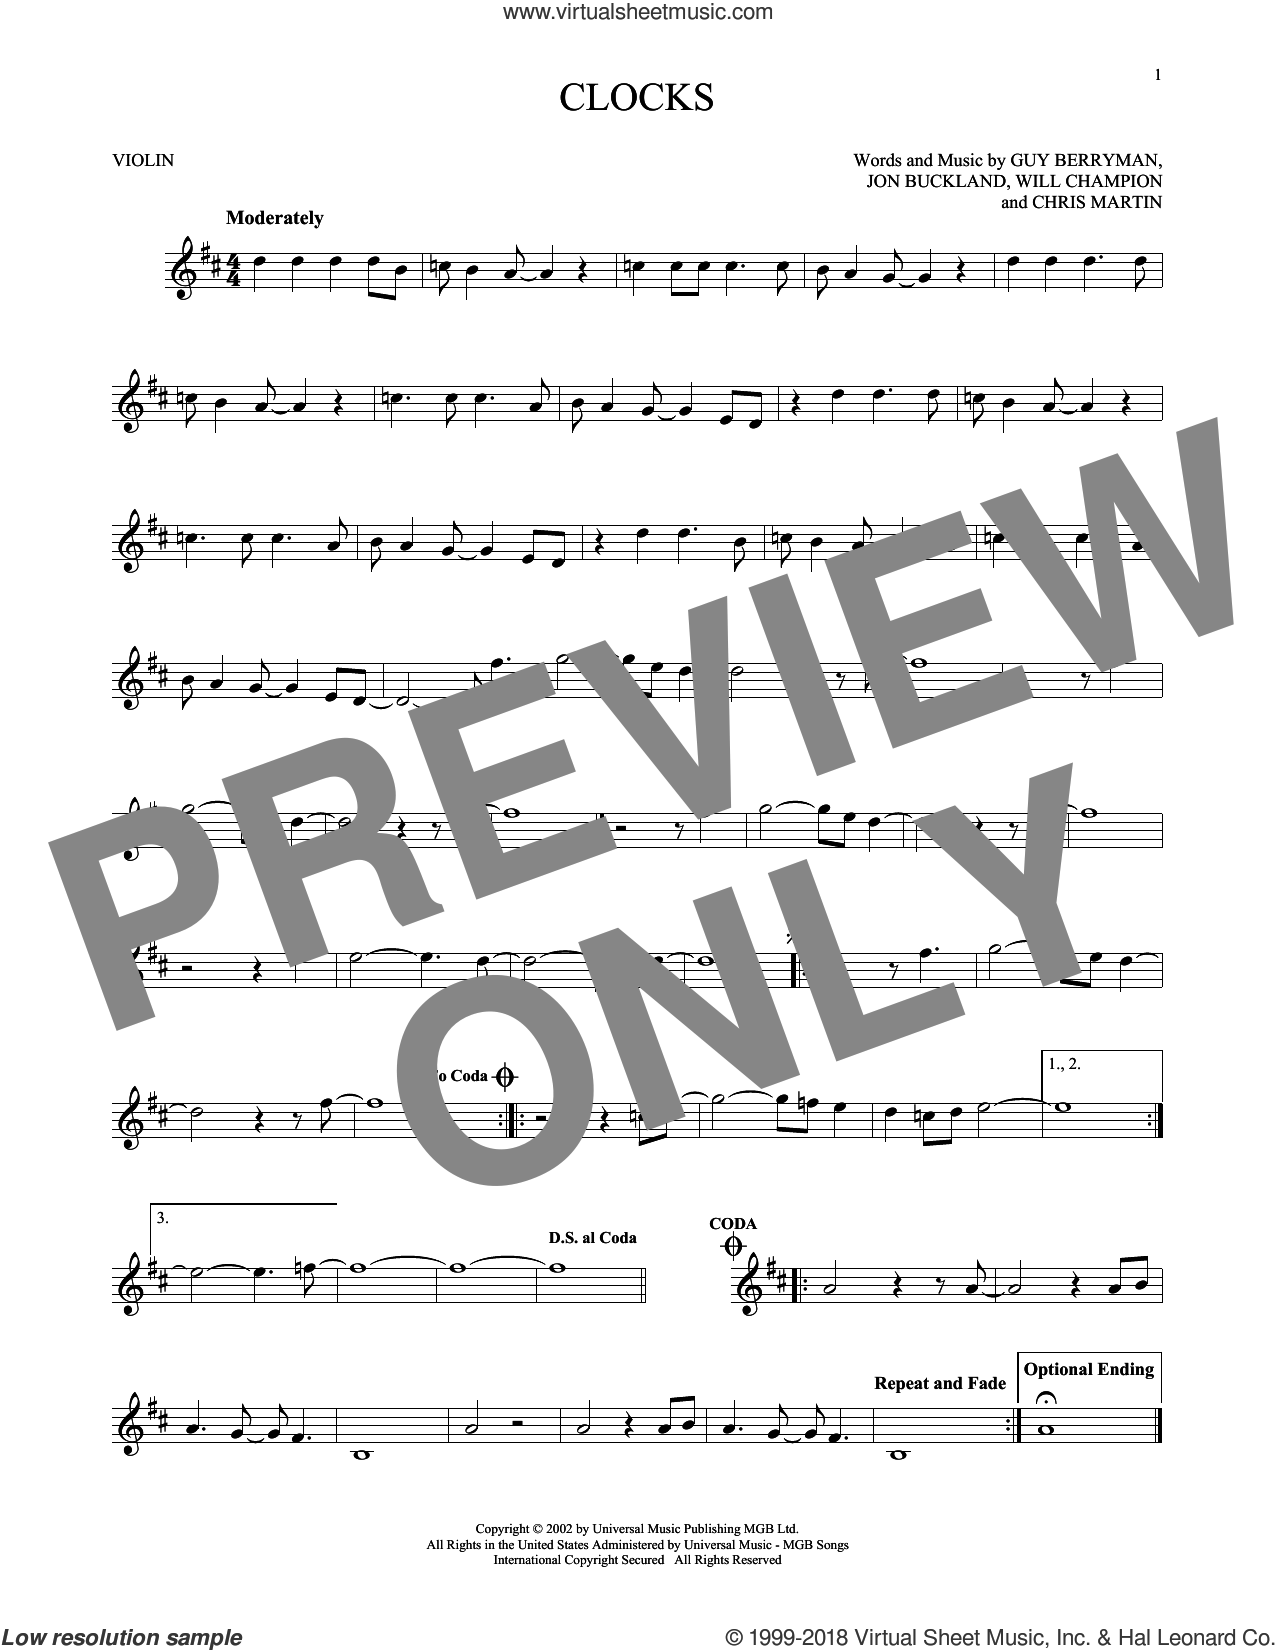 Clocks sheet music for violin solo by Chris Martin, Coldplay, Guy Berryman, Jon Buckland and Will Champion, intermediate skill level